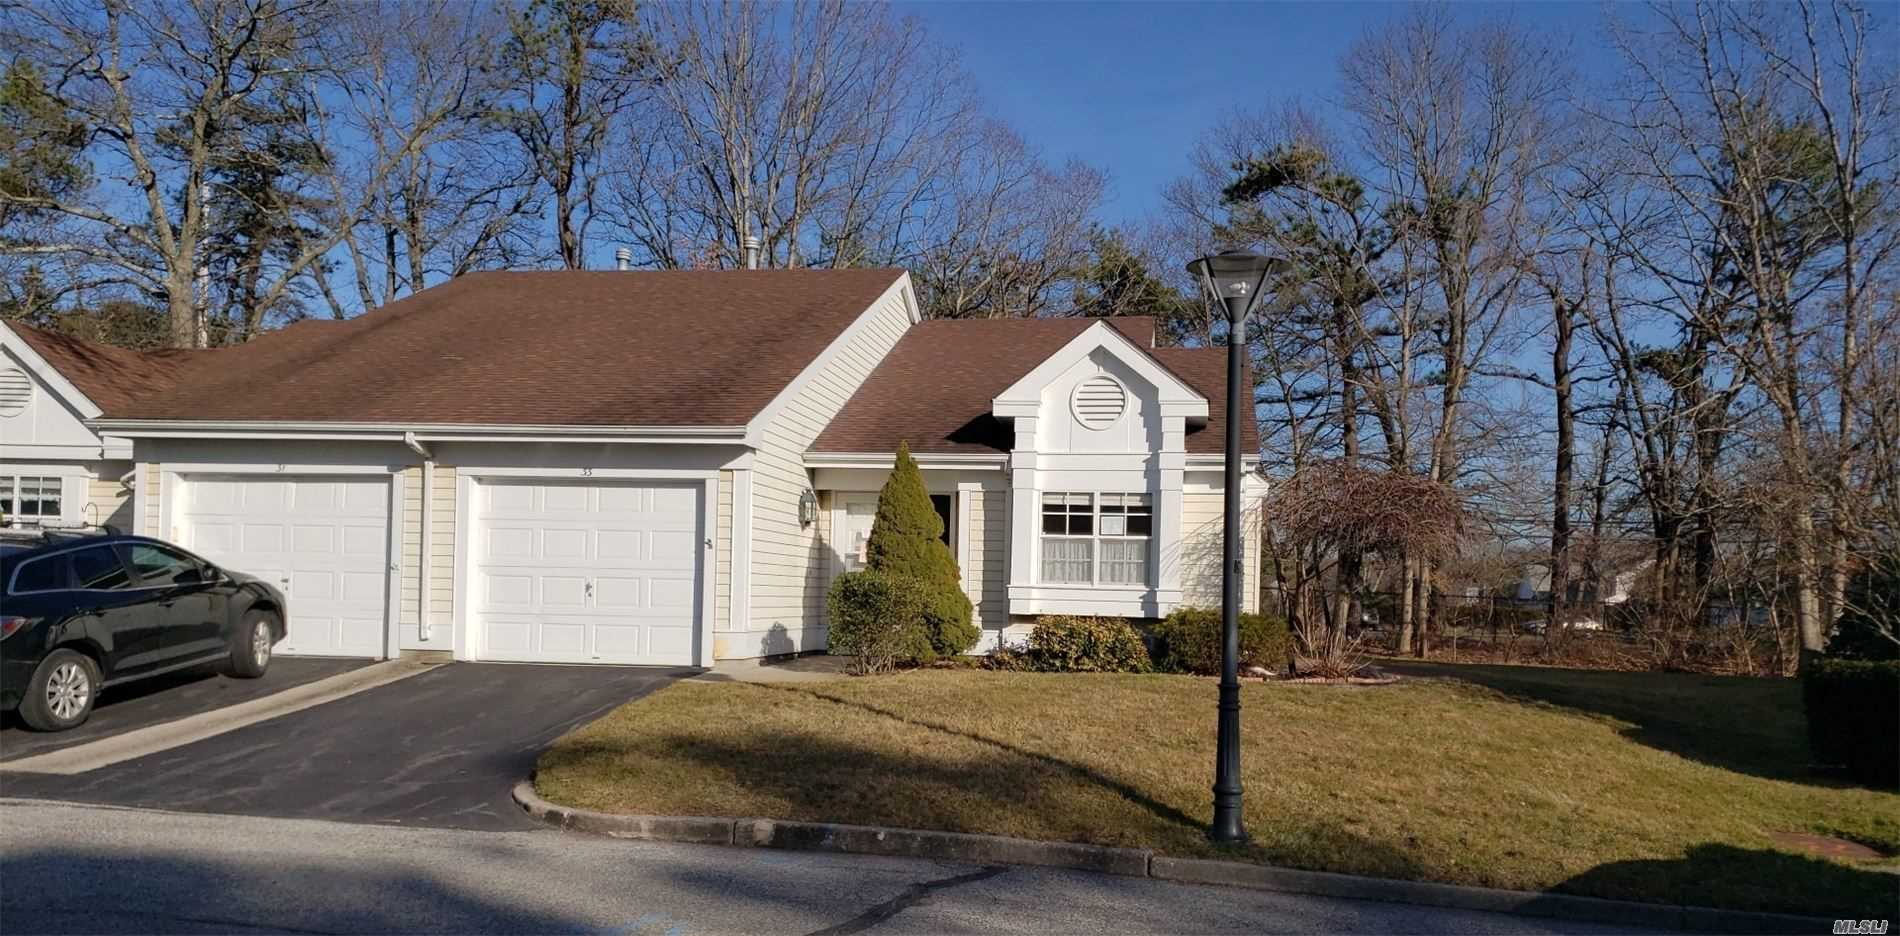 Property for sale at 33 Glen Drive, Ridge NY 11961, Ridge,  New York 11961